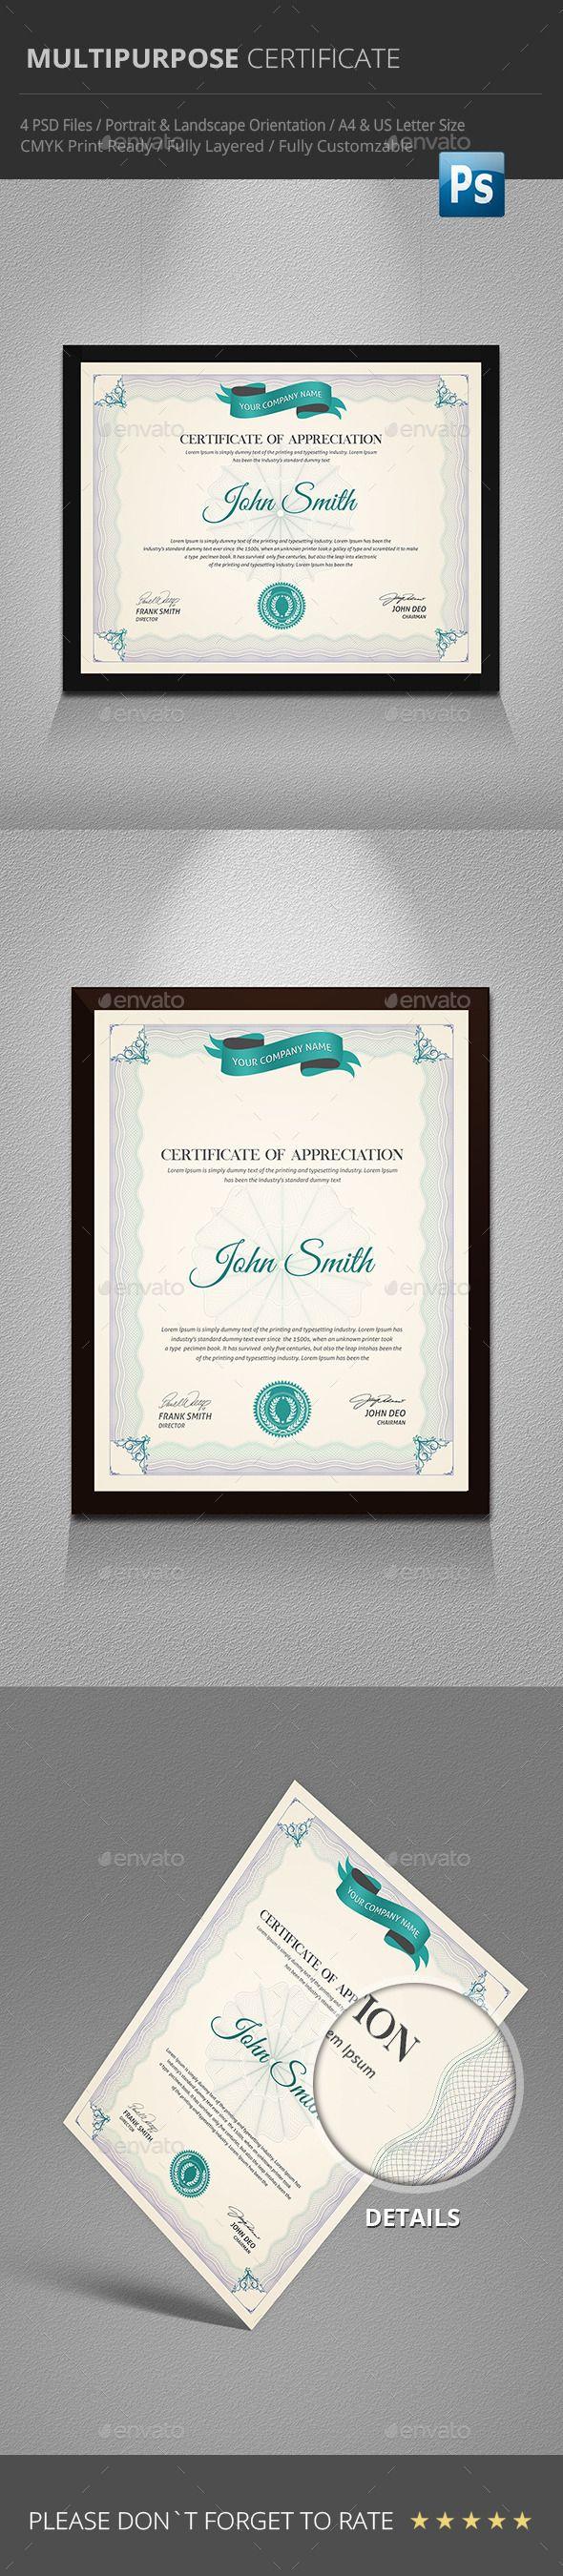 Certificate | Urkunden